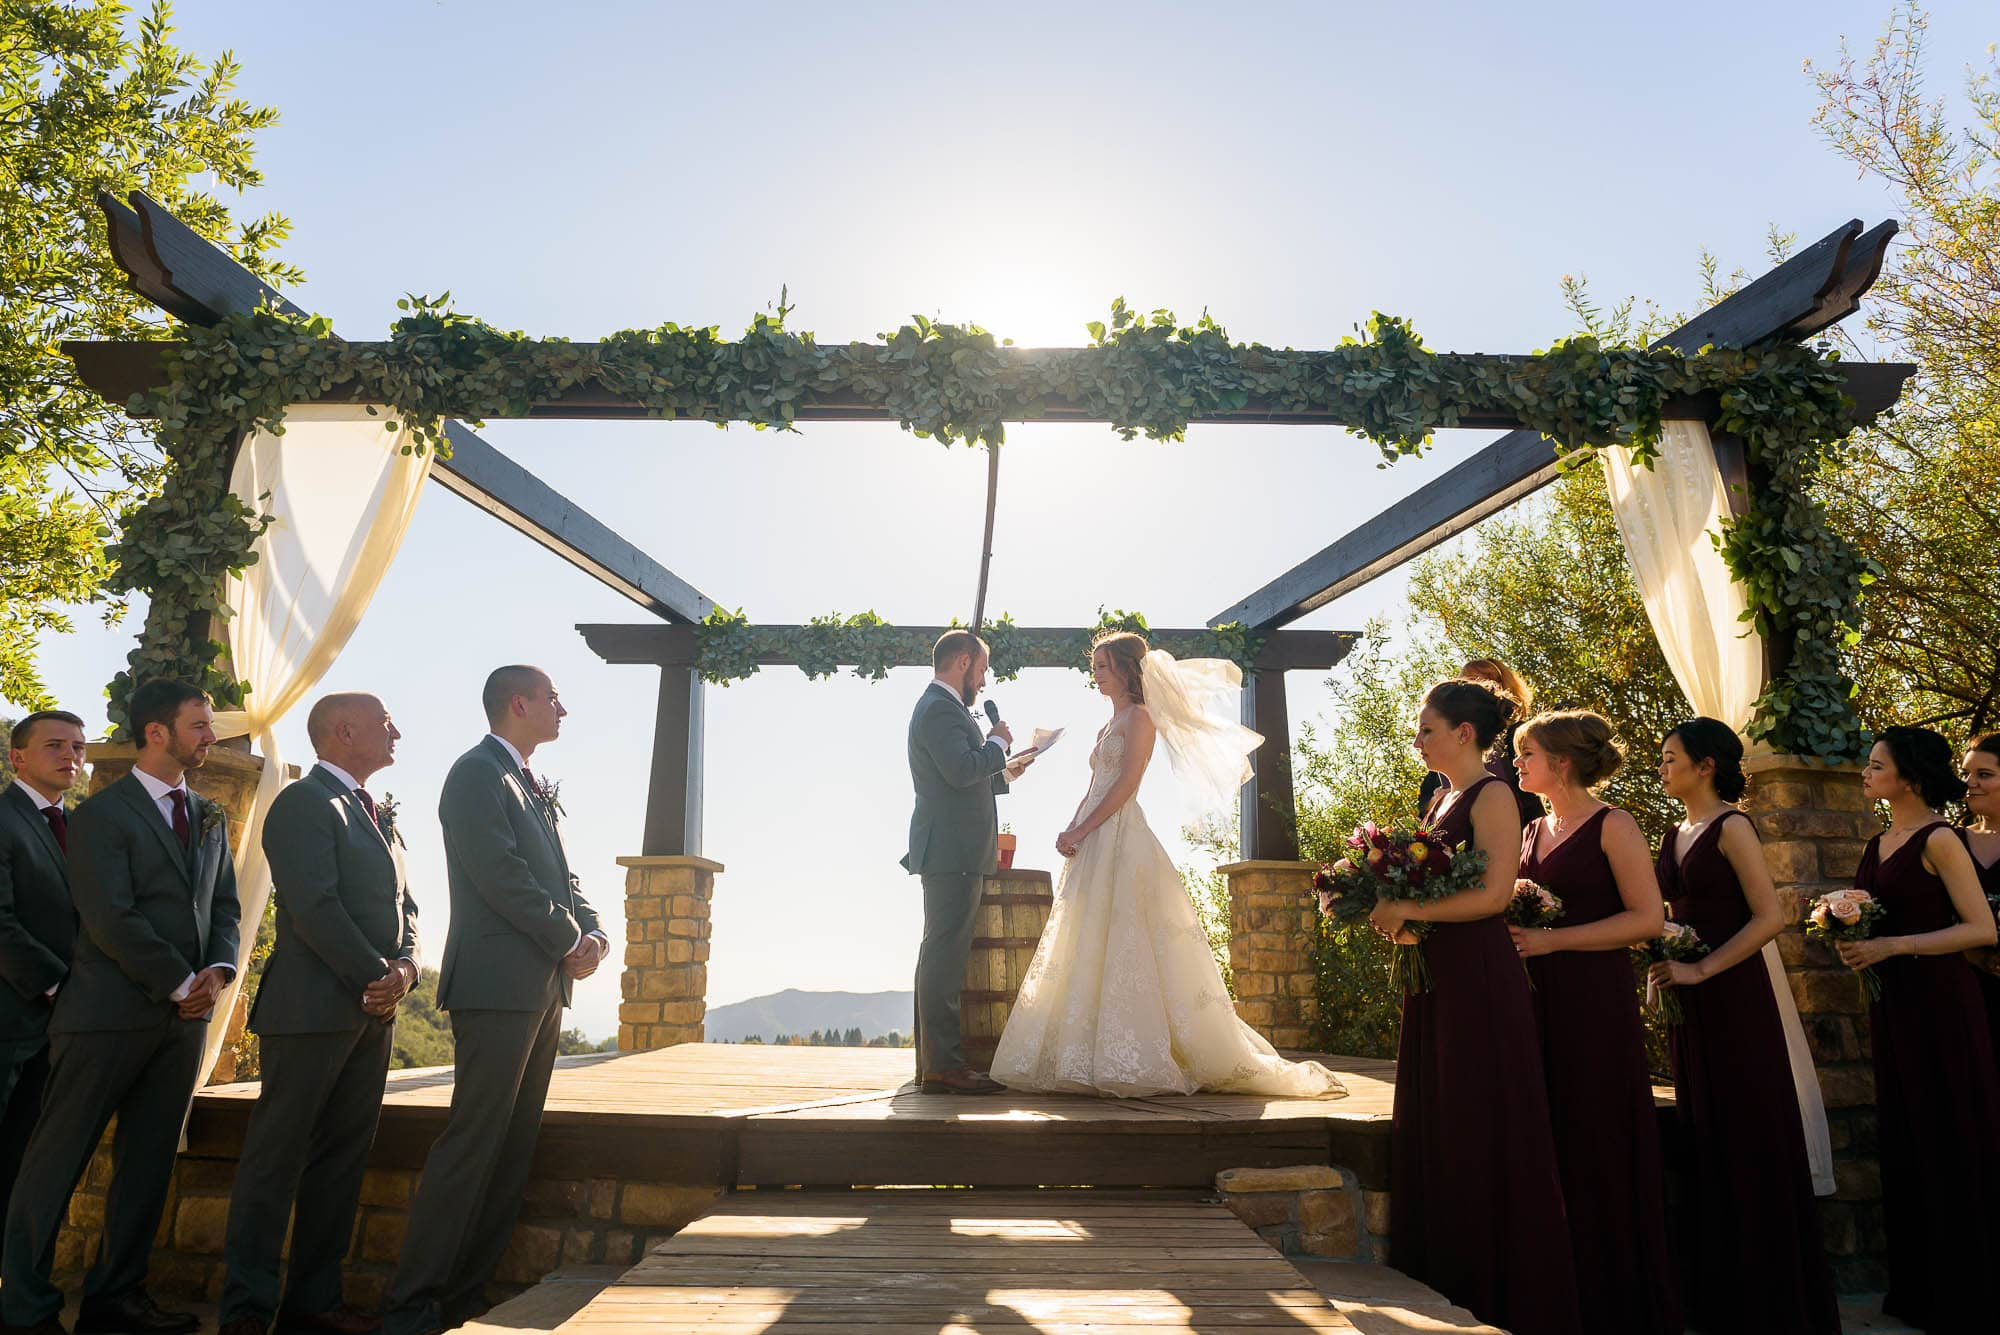 269_Alan_and_Heidi_Serendipity_Garden_Wedding_10-27-2018